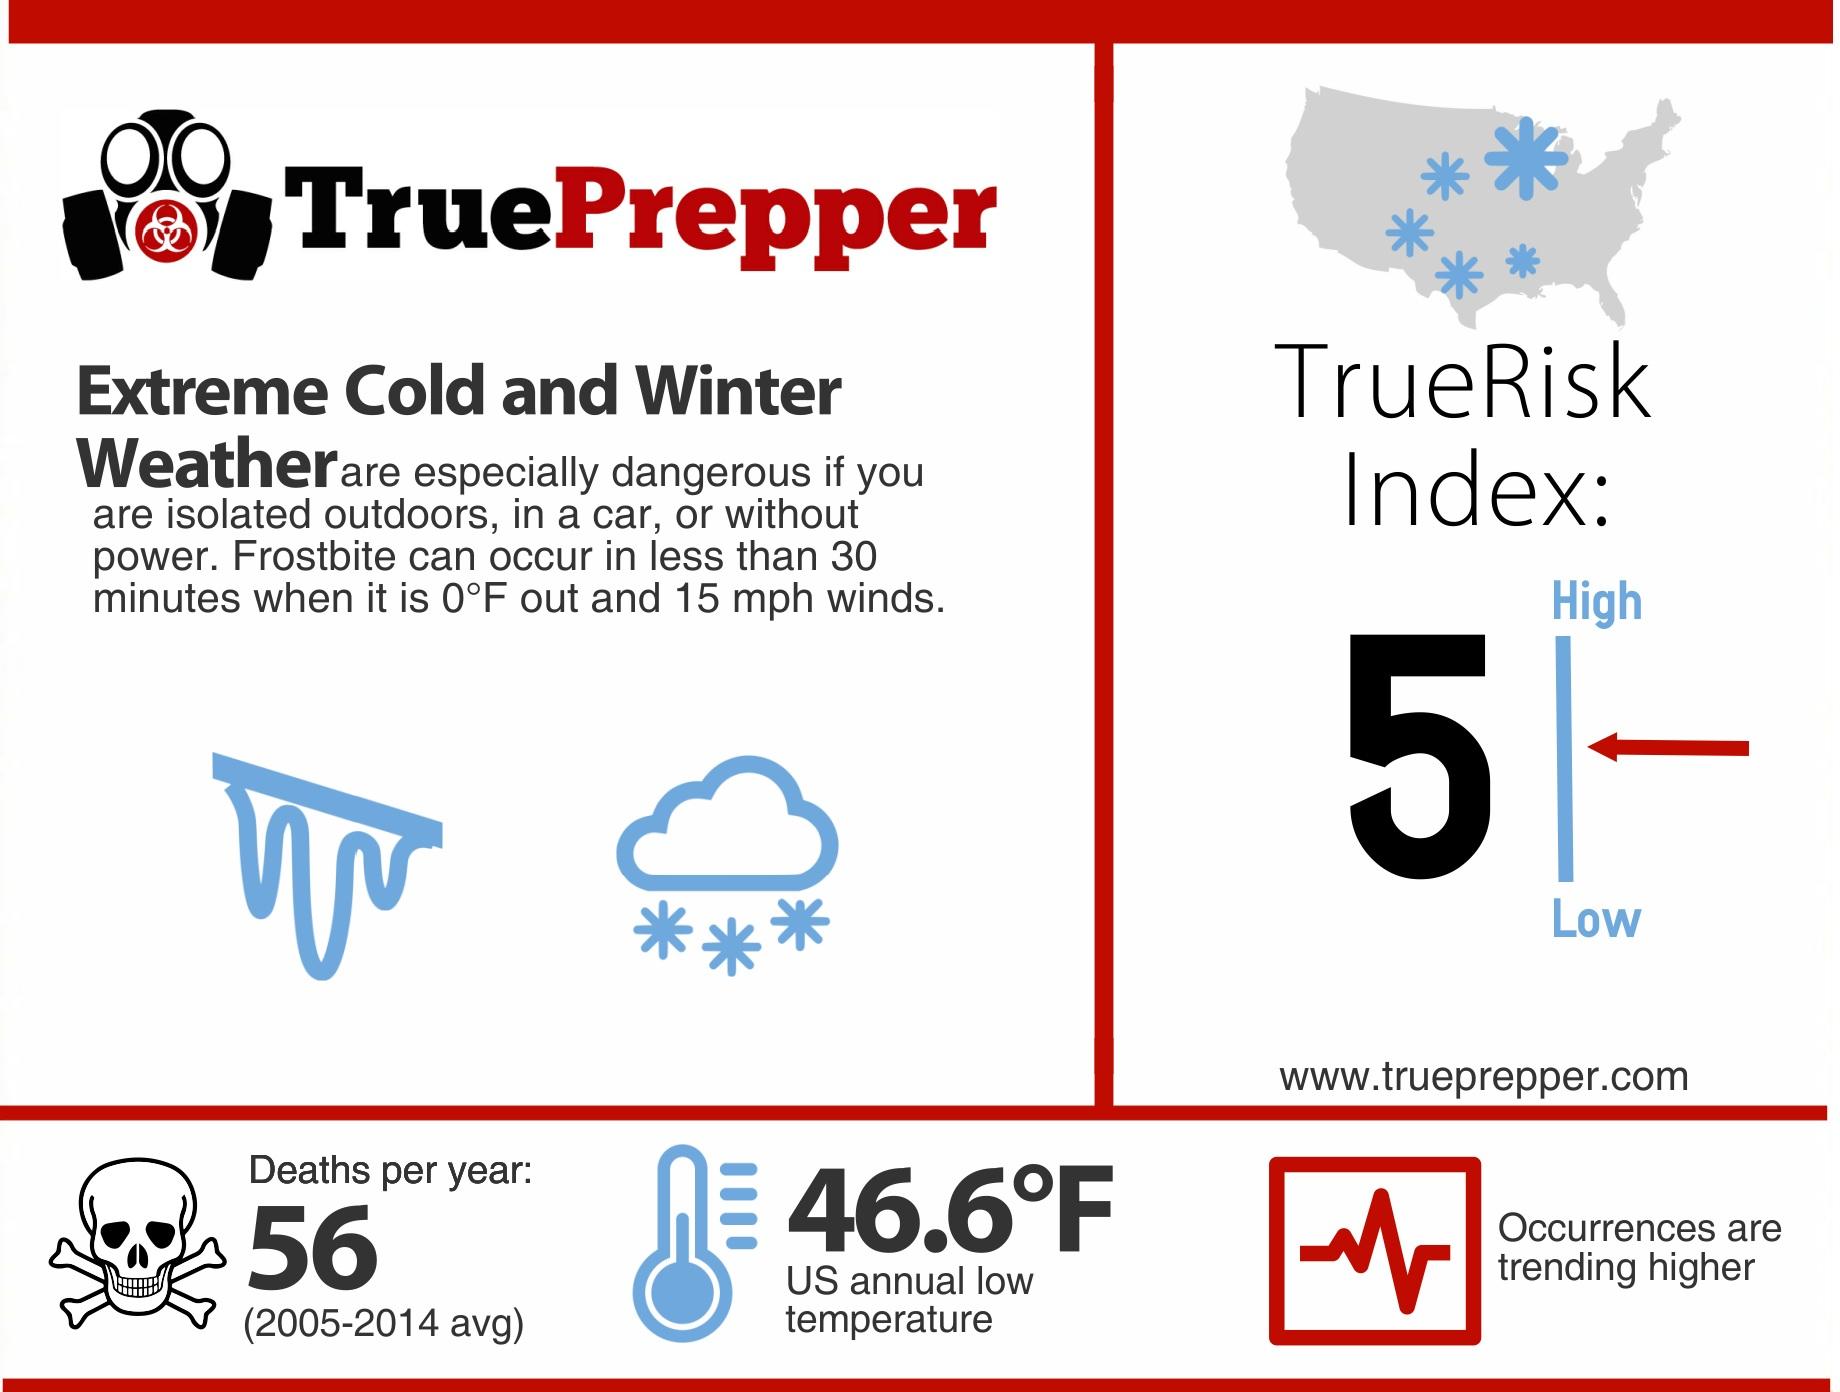 TrueRisk Extreme Cold